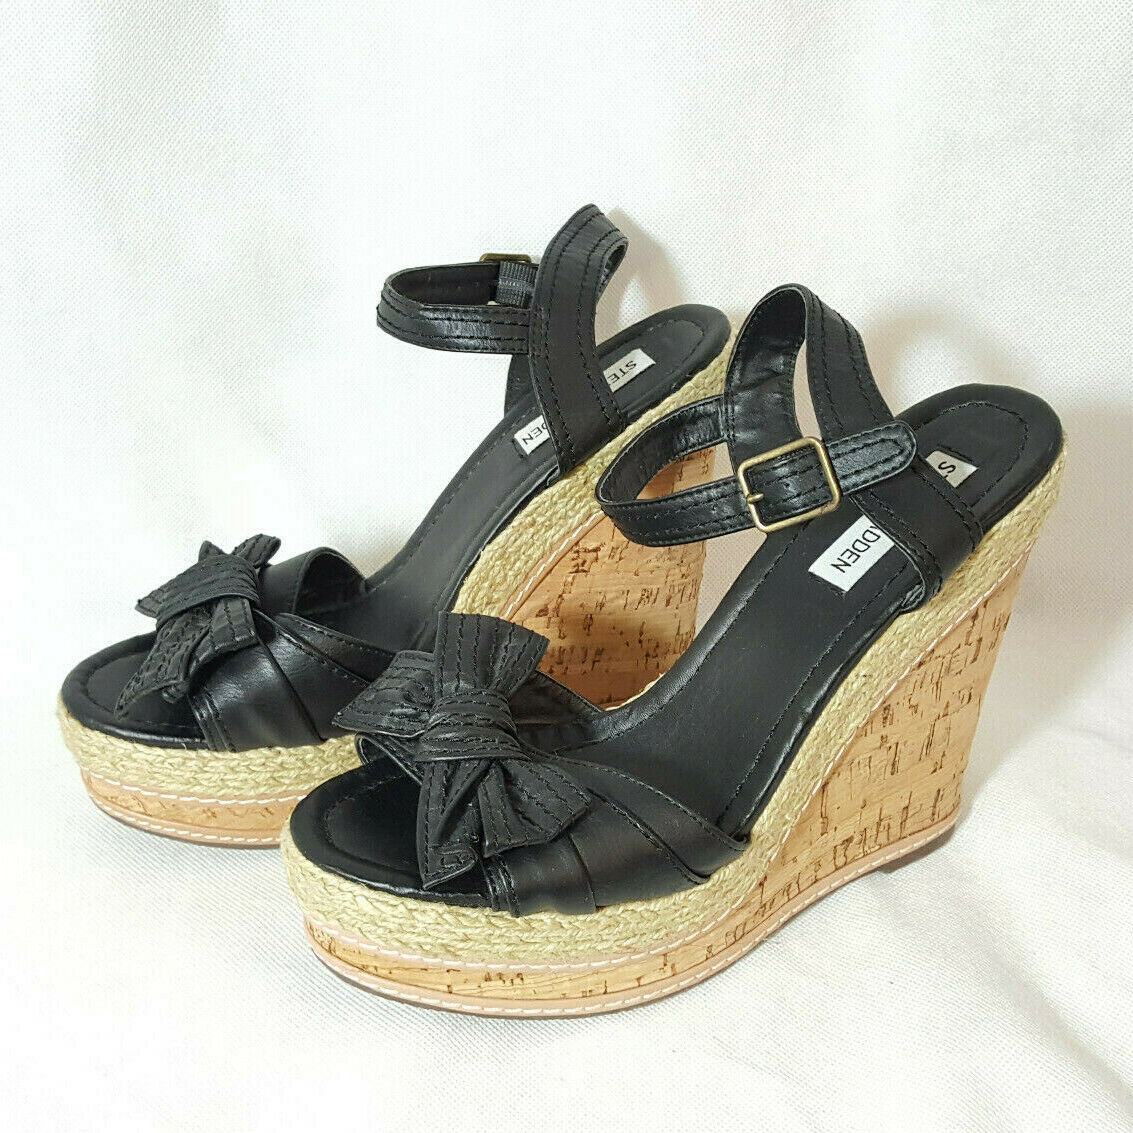 NEW Steve Madden Platform Wedge Sandal Sz 9 Black Ankle Strap Bow